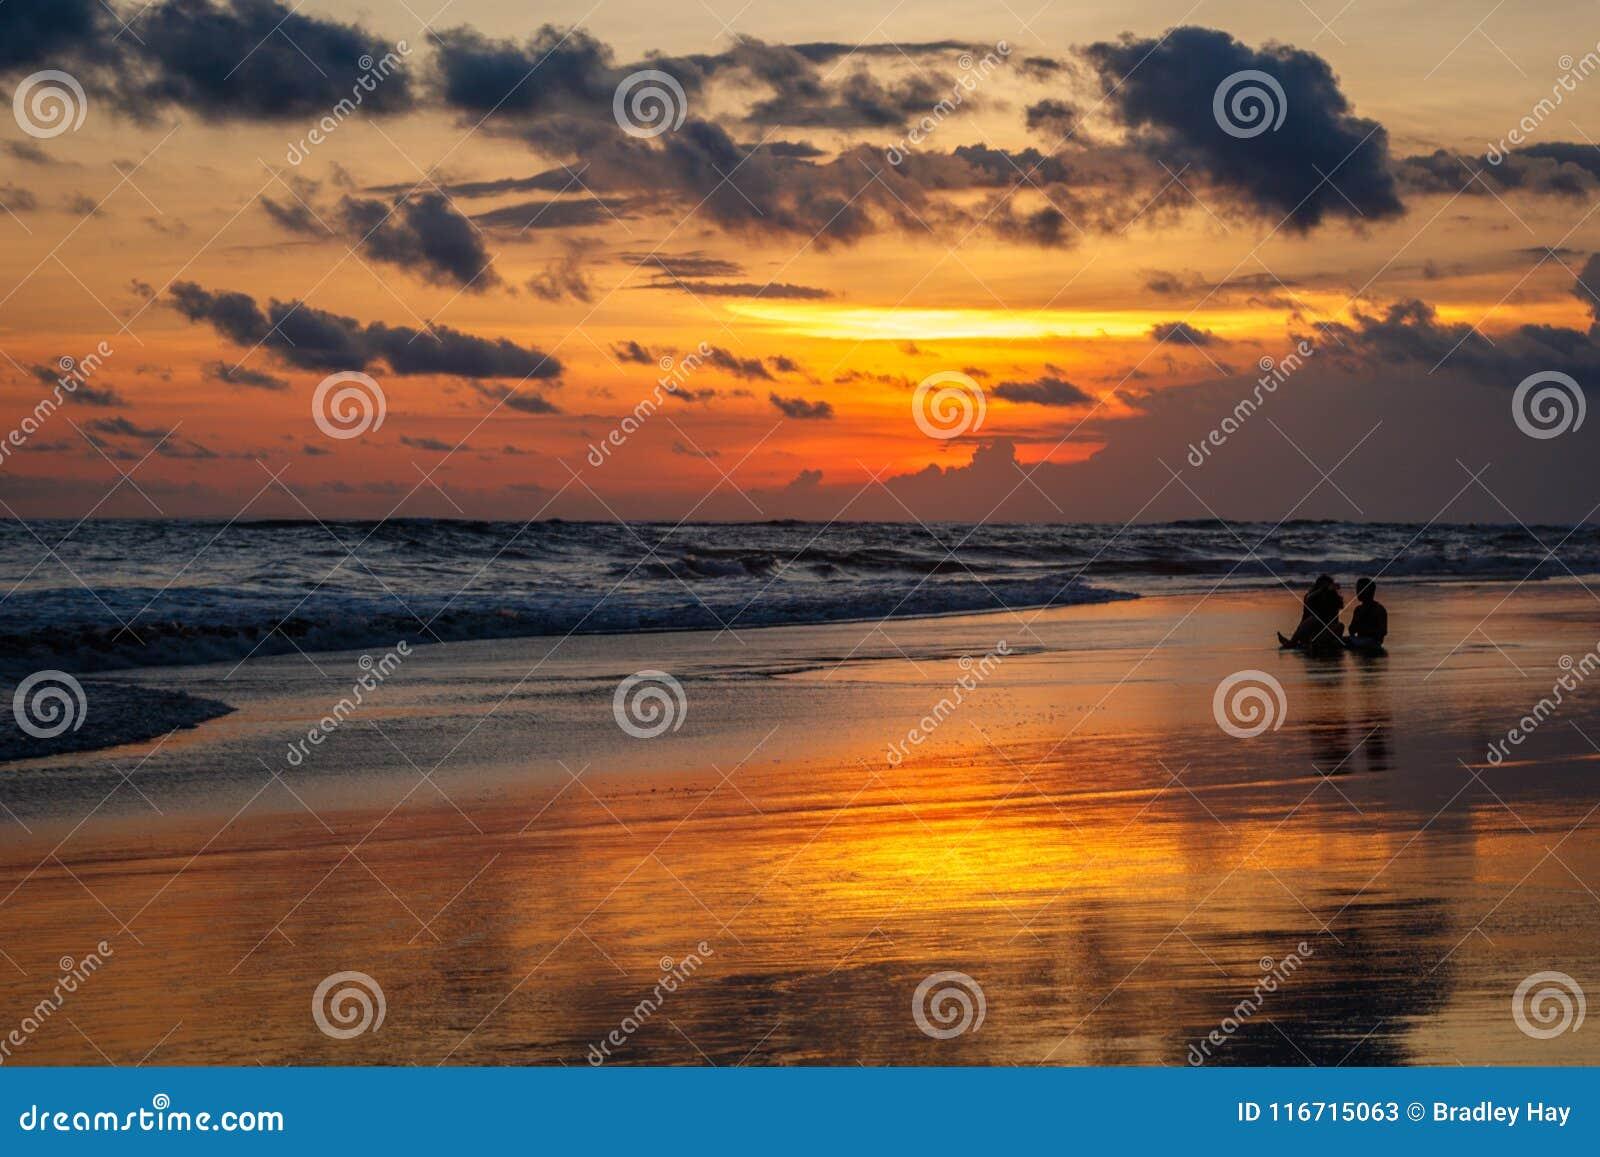 Berawa beach Pantai Berawa at sunset. Silhouettes of two people sitting in the tide. Canggu, Bali, Indonesia.